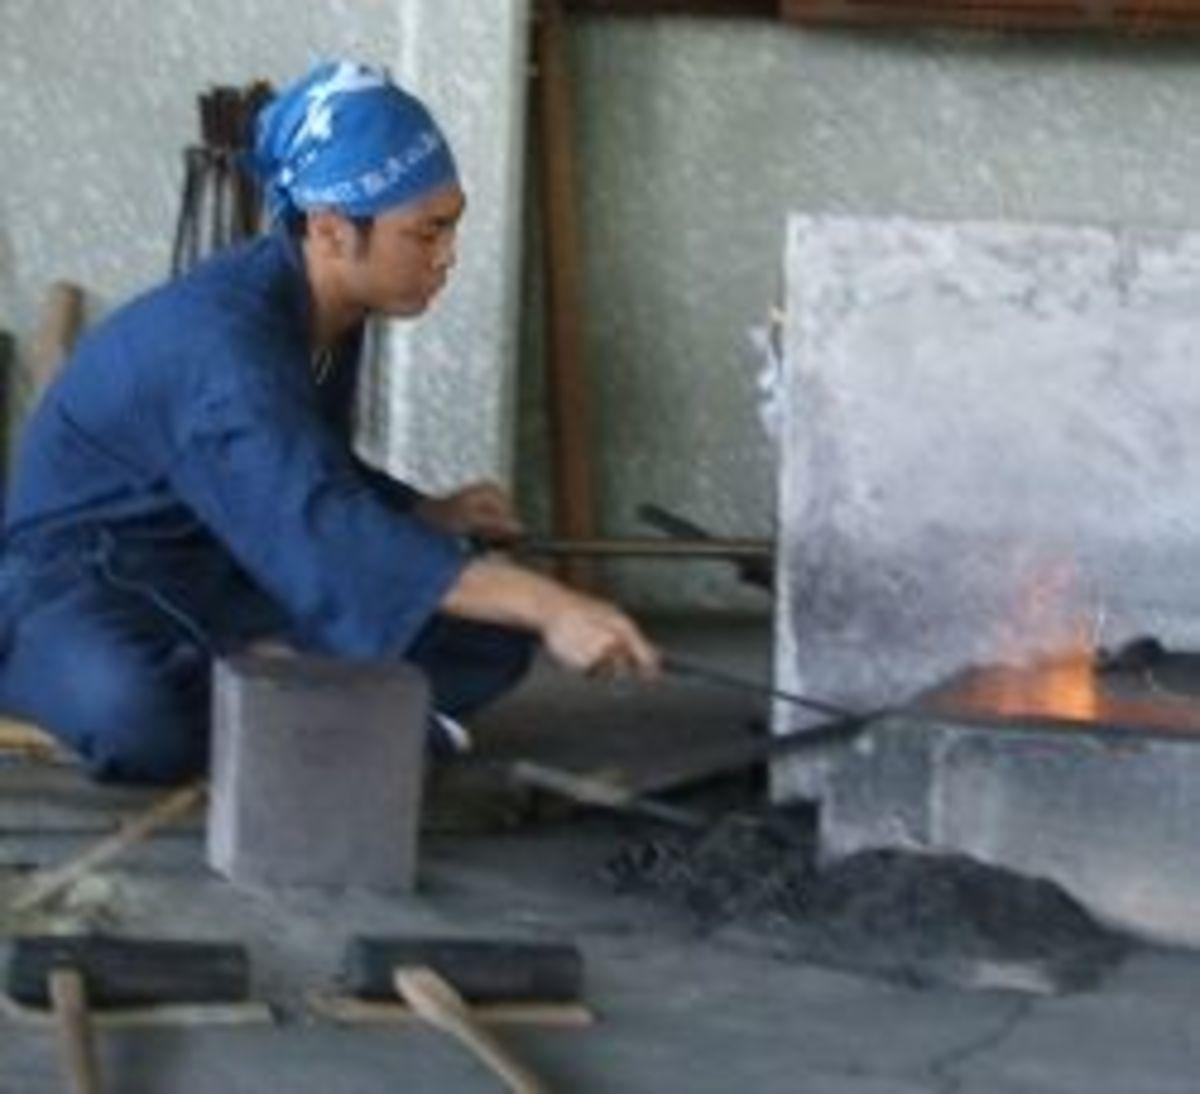 Forging a katana sword